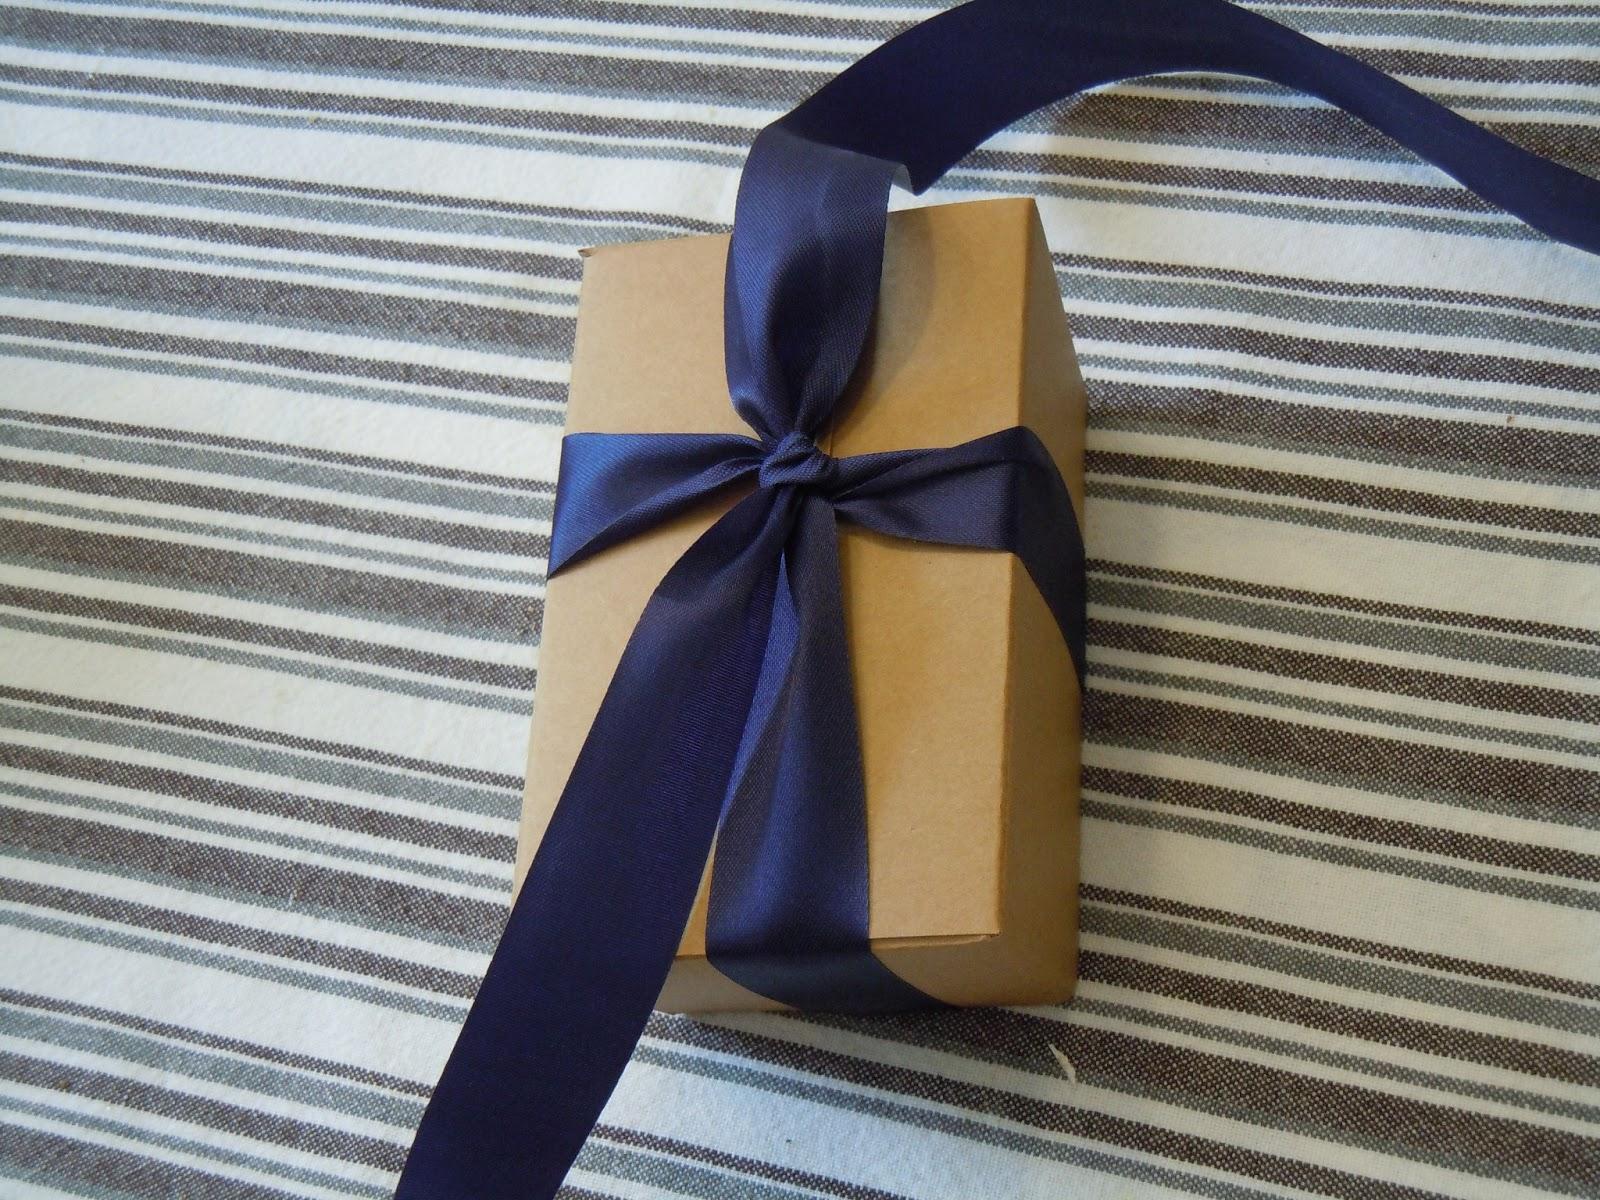 etat de choc atelier diy comment emballer vos chocolats. Black Bedroom Furniture Sets. Home Design Ideas